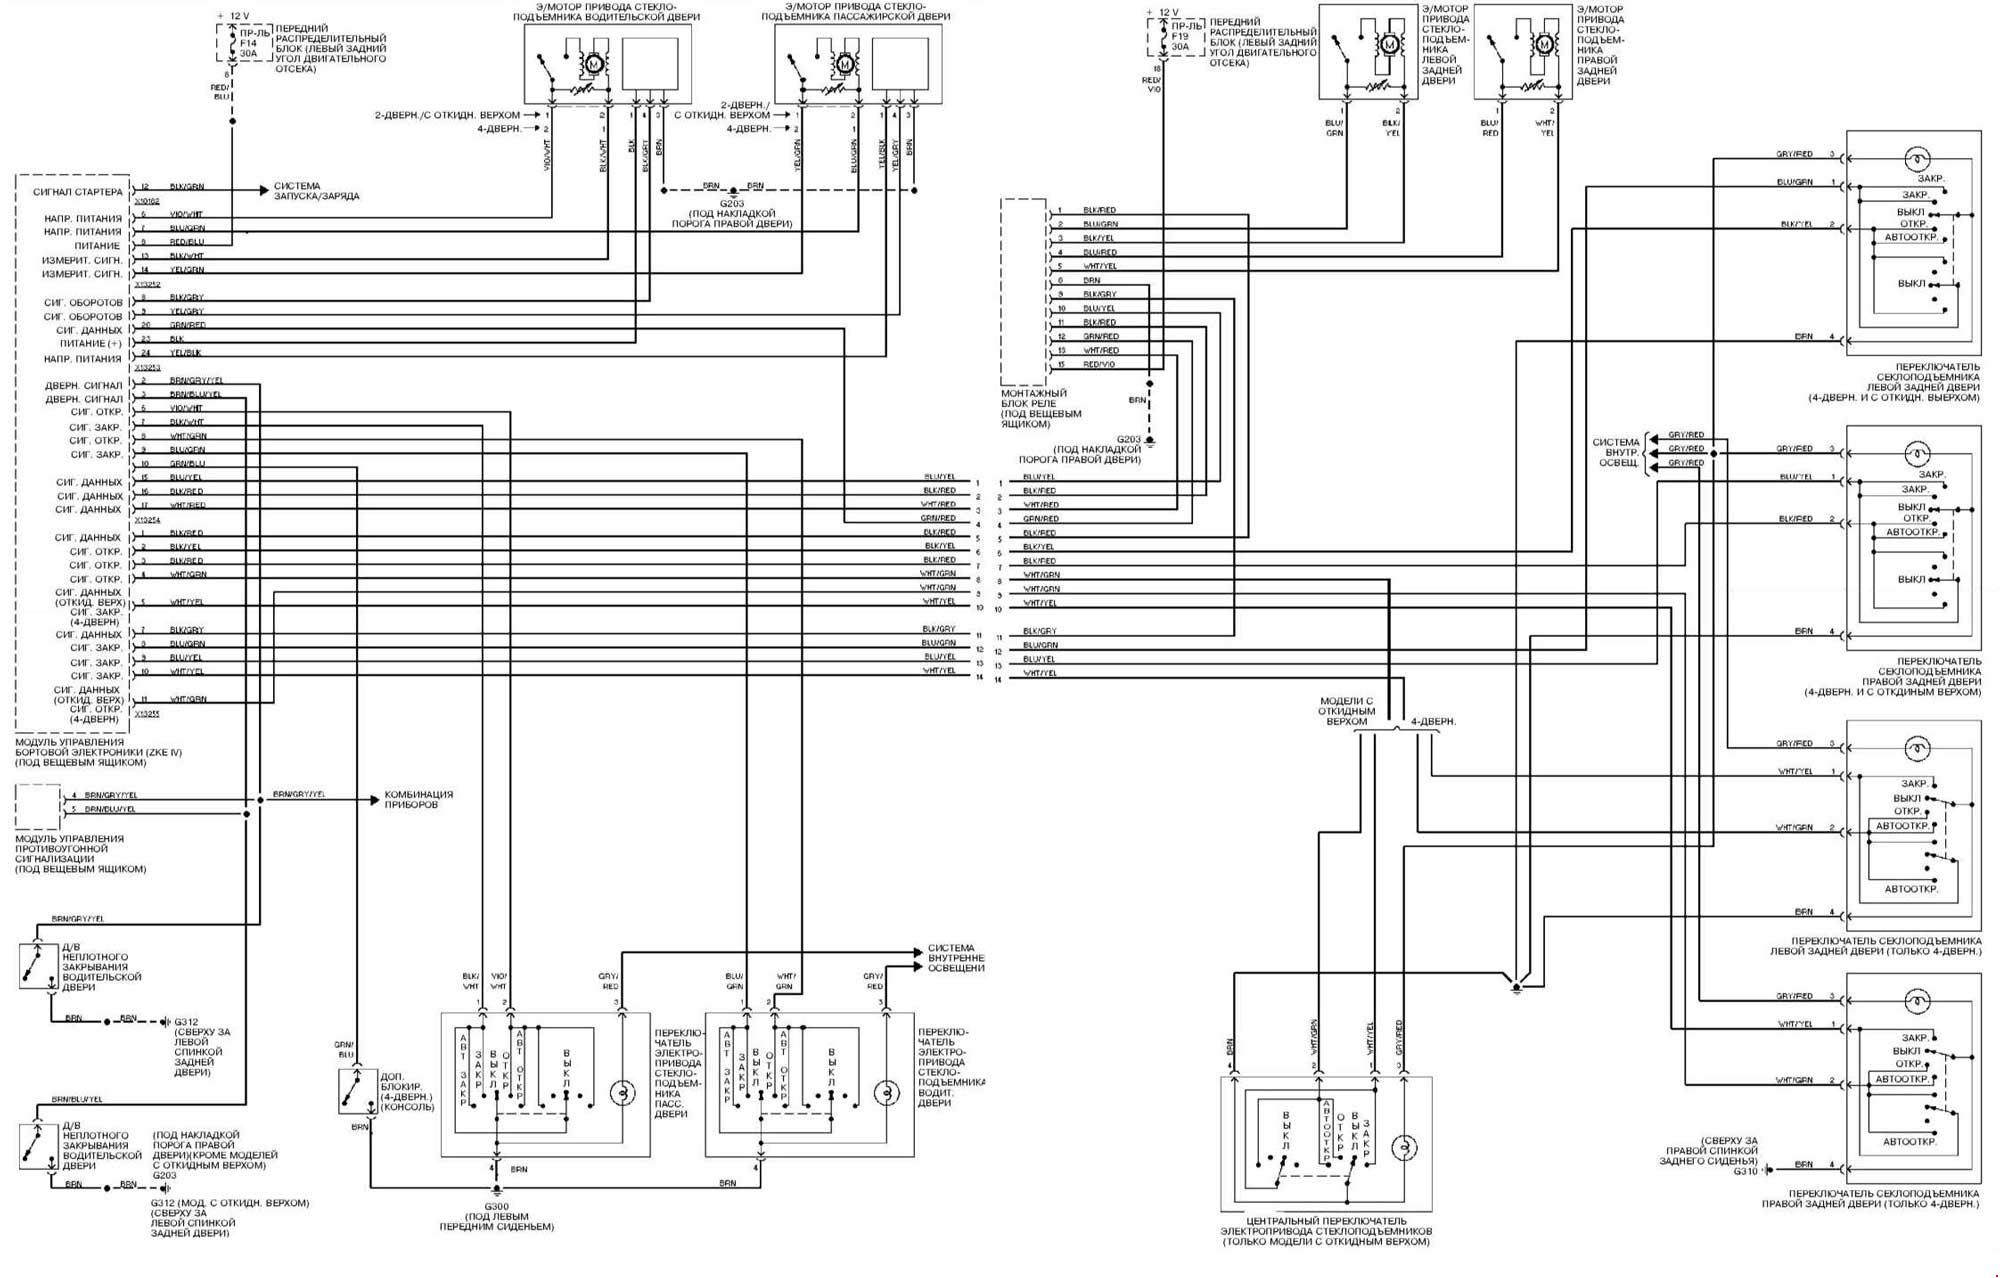 BMW 3 E46 EWD - Free PDF's | Bmw E46 Wiring Diagram Pdf |  | BMW Service Documentation & Wiring Diagram